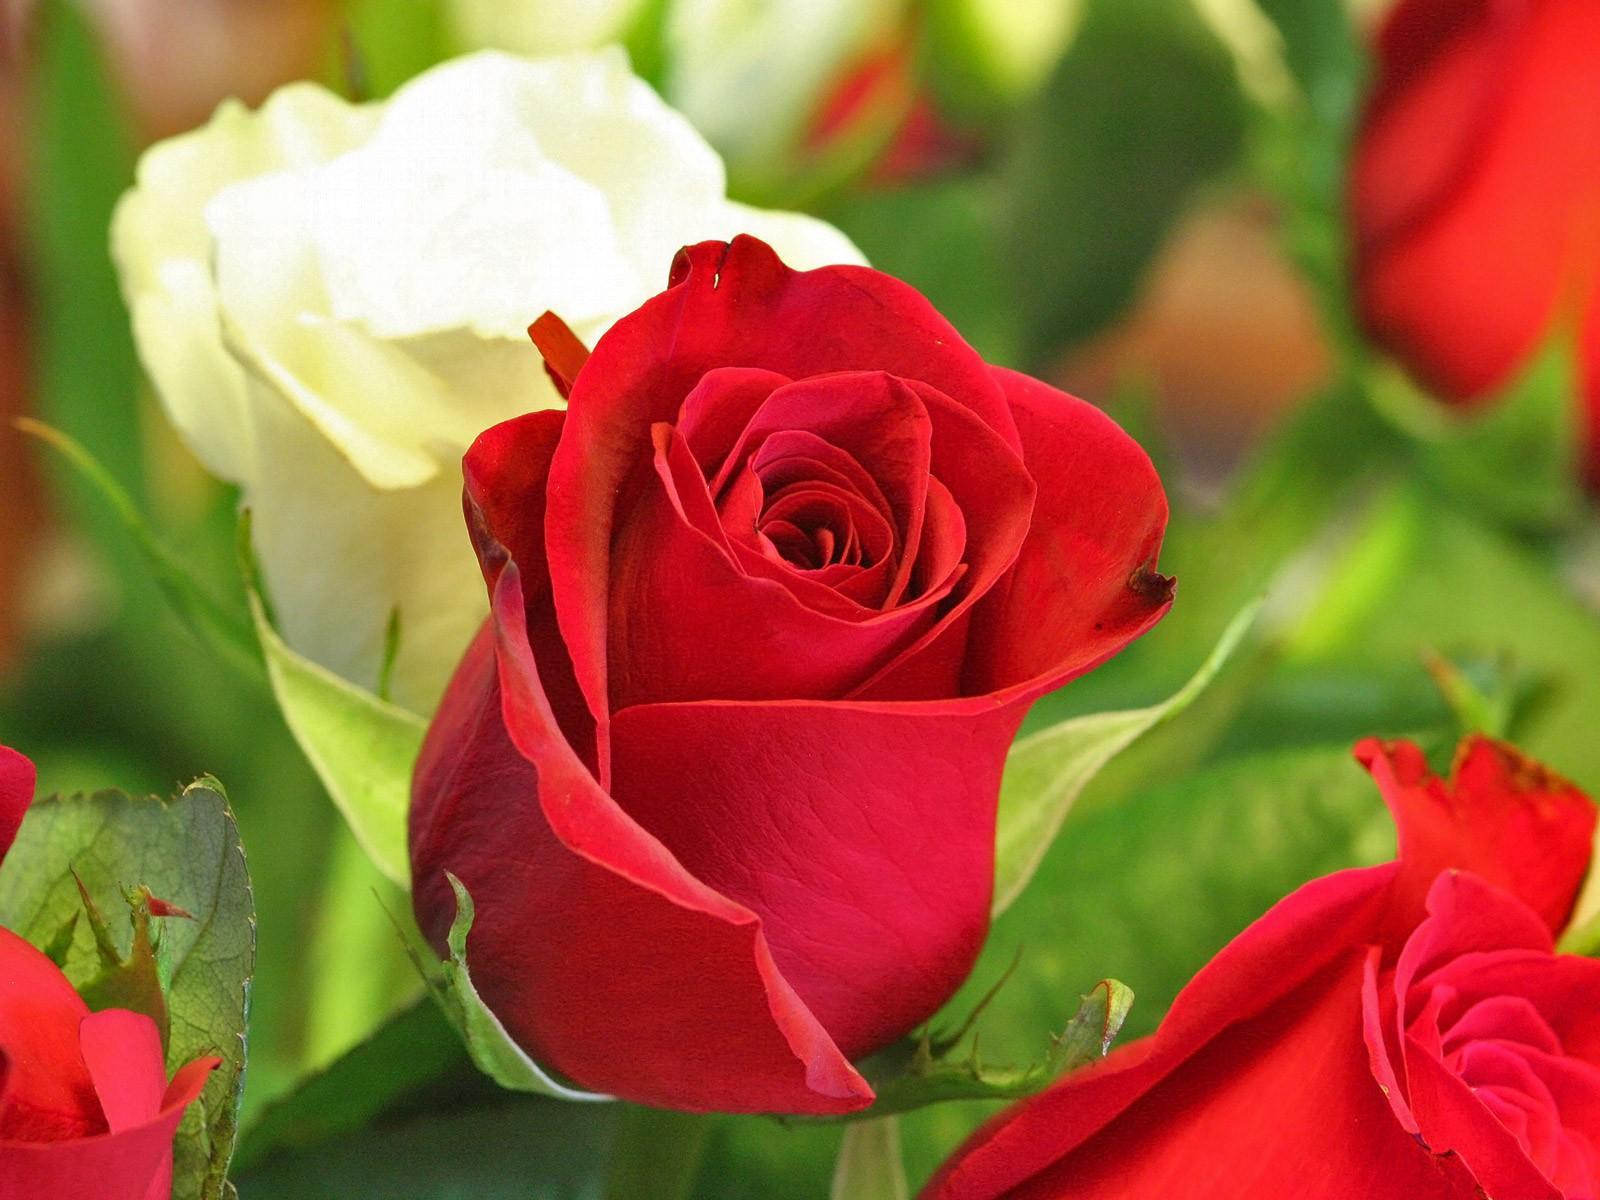 flowers wallpaper red